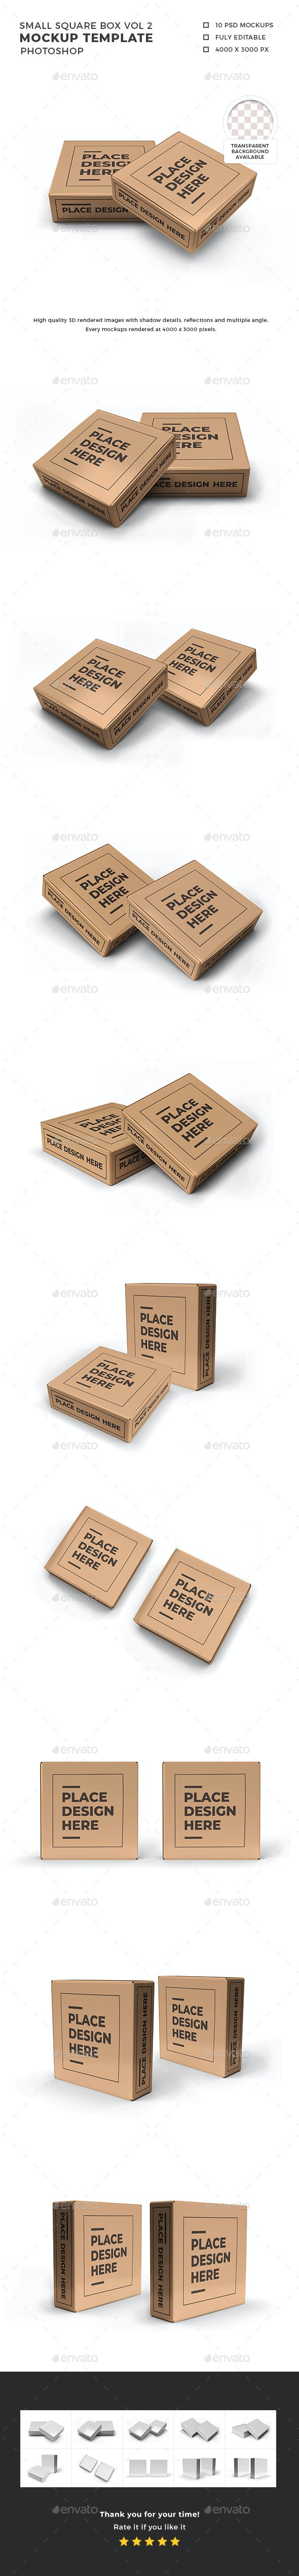 Small Square Box Mockup Template Vol 2 - Packaging Product Mock-Ups